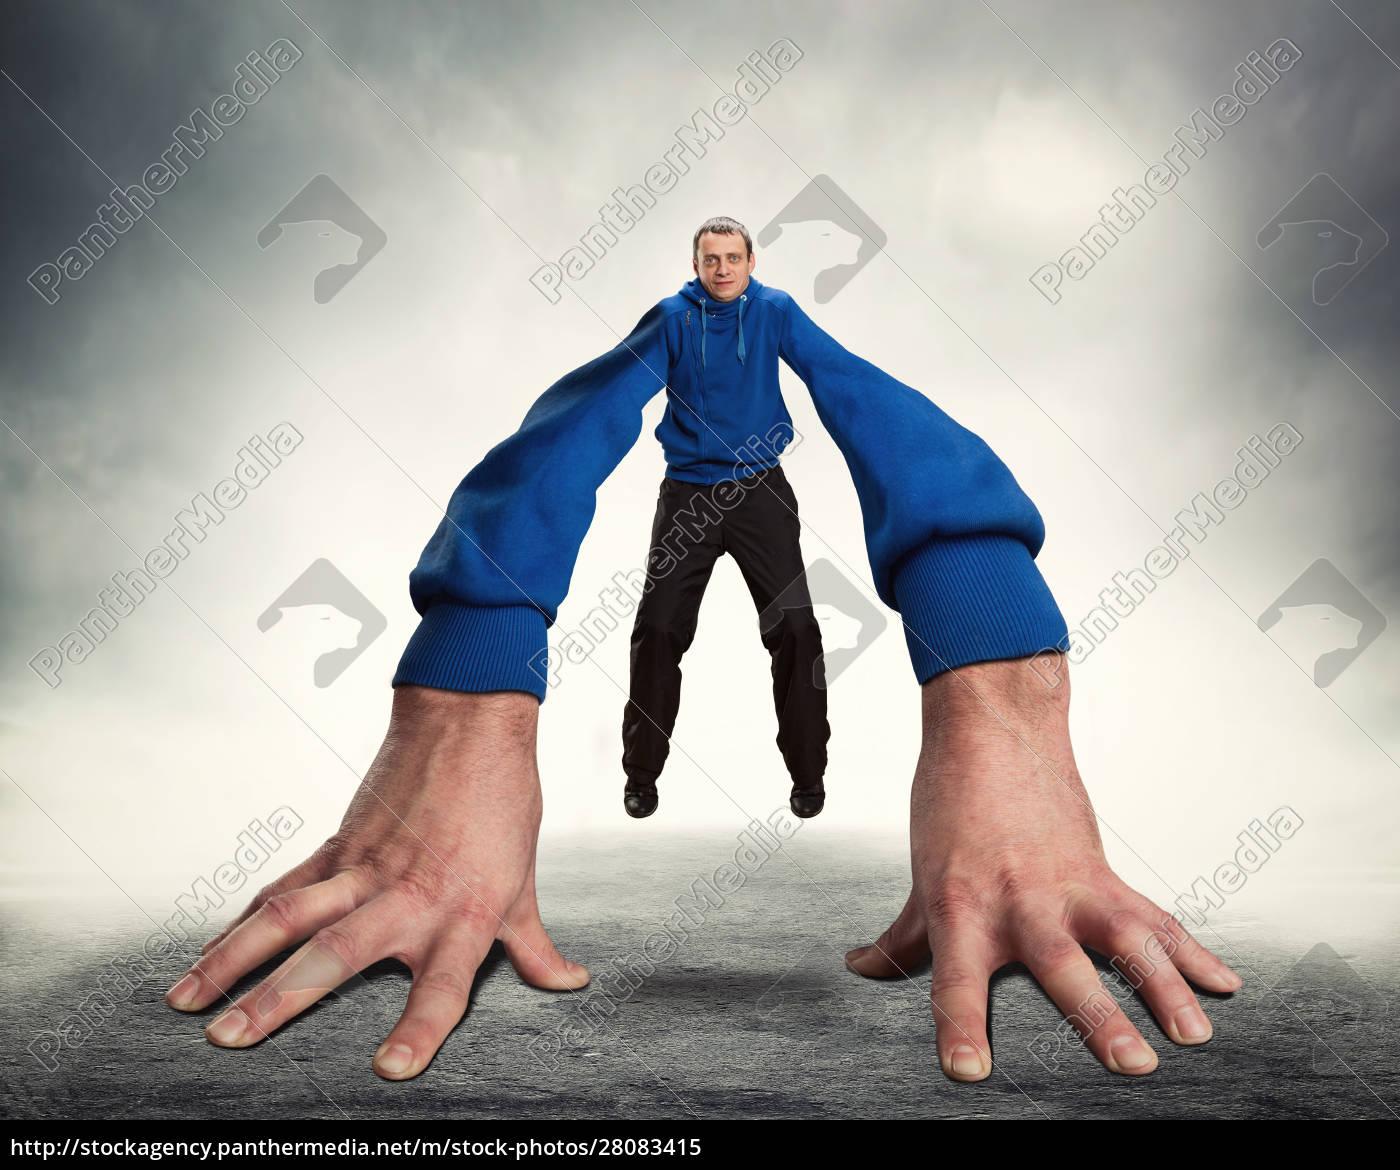 strange, man, with, big, hands - 28083415